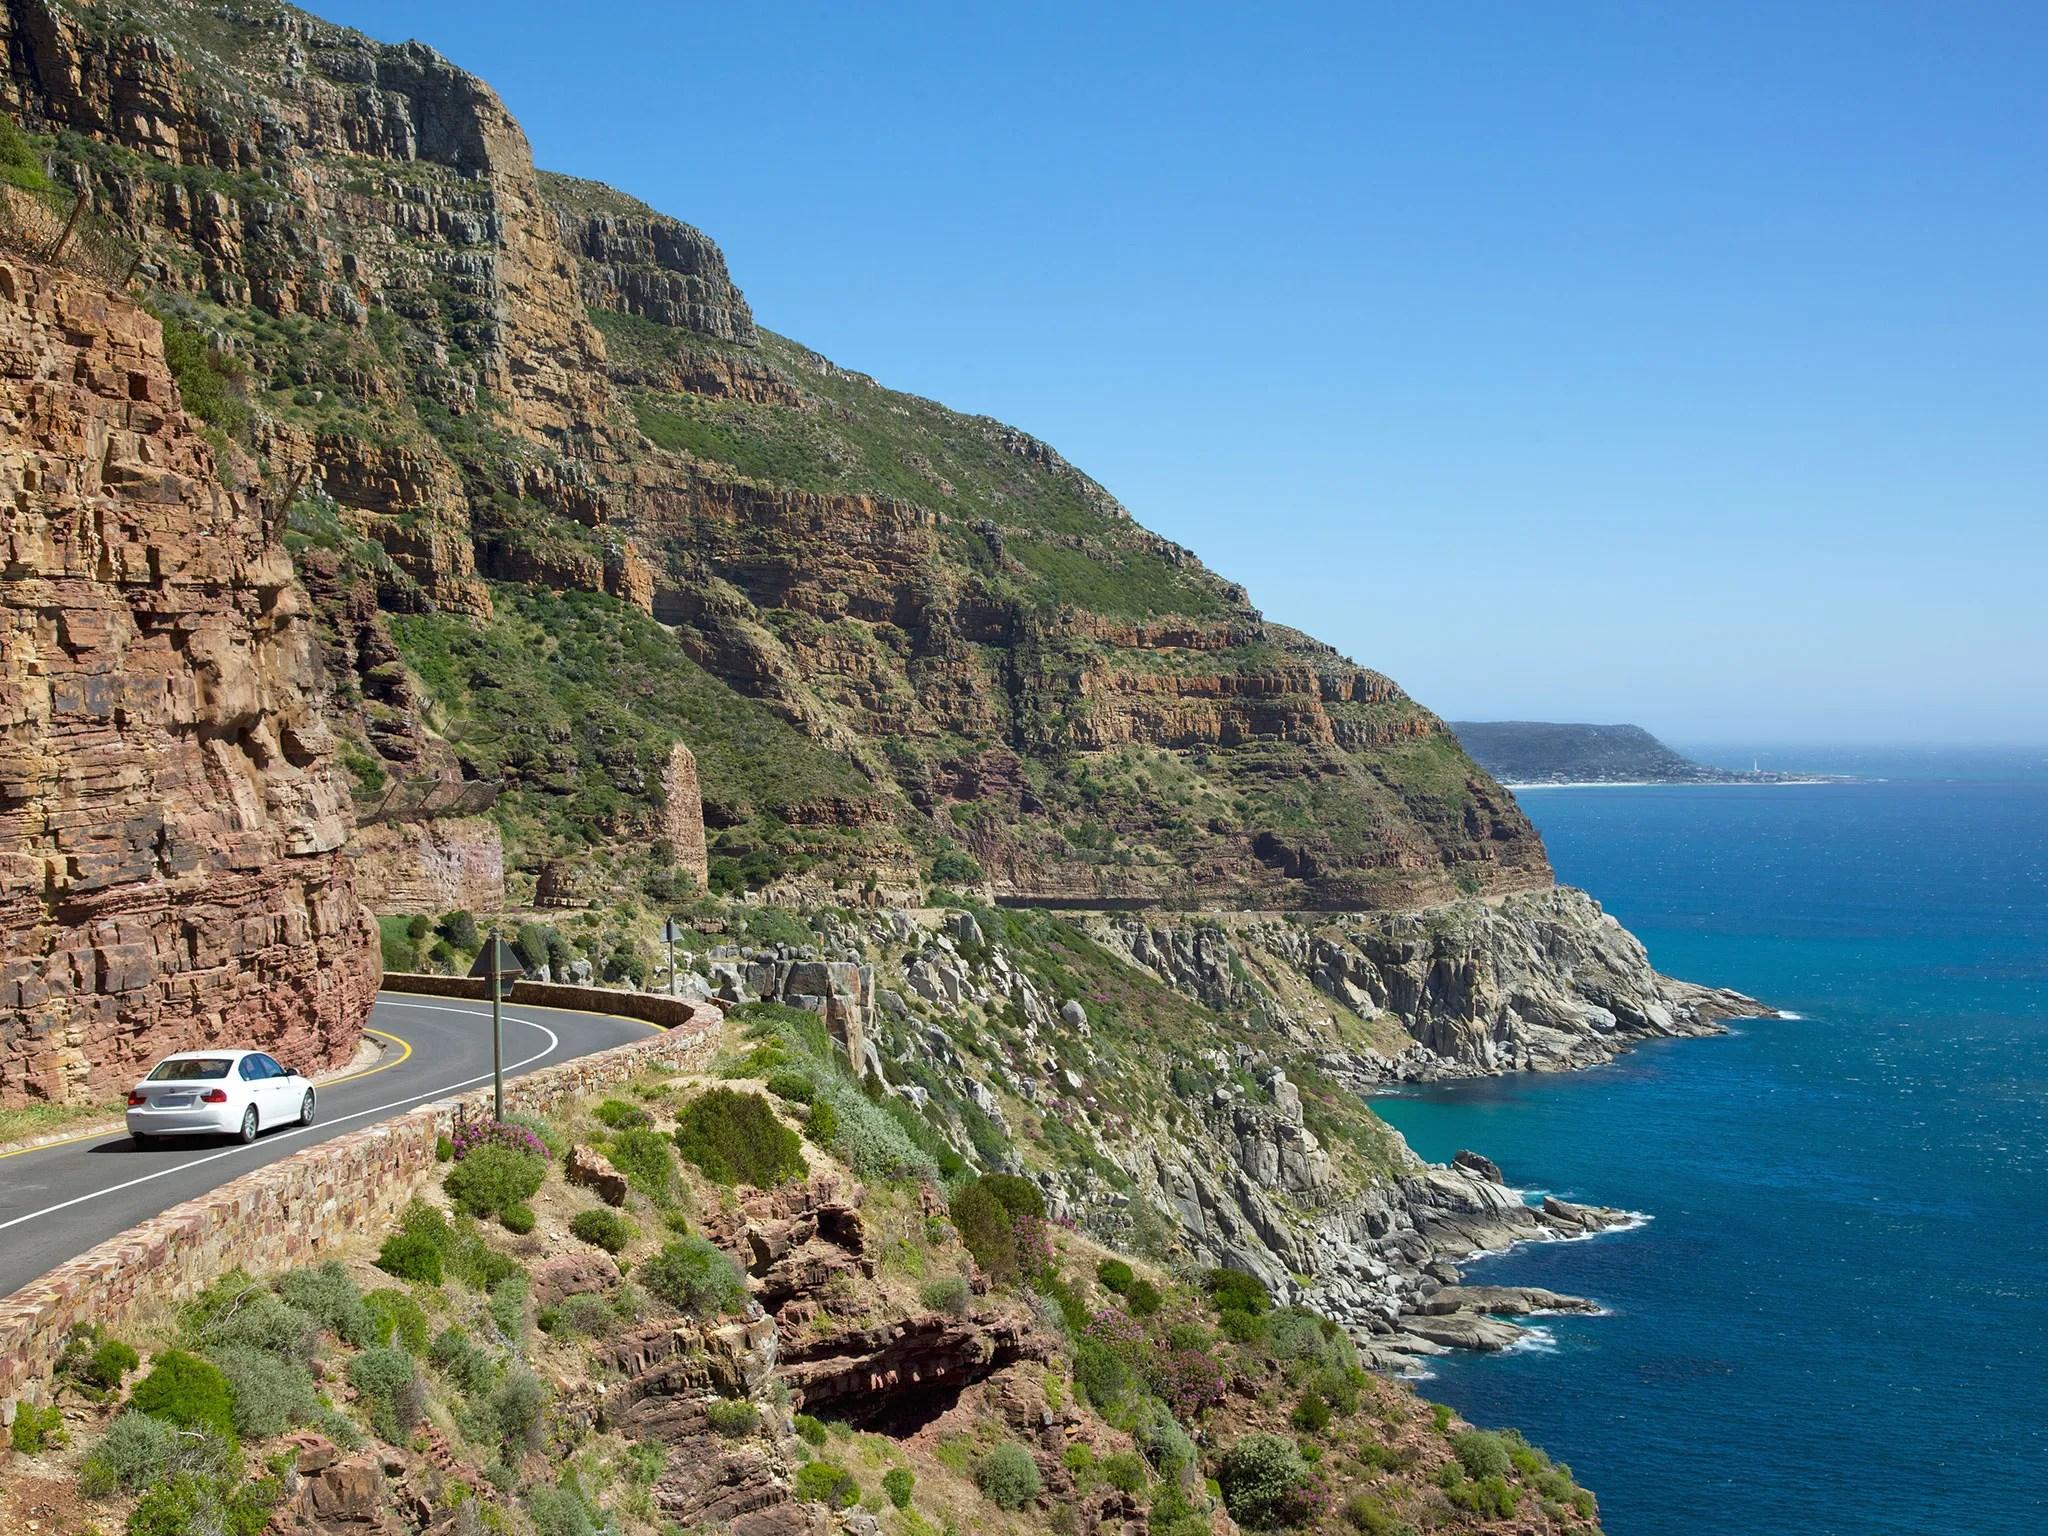 Car Curvy Road Wallpaper Chapman S Peak Drive A Guide To Cape Town S Best Coastal